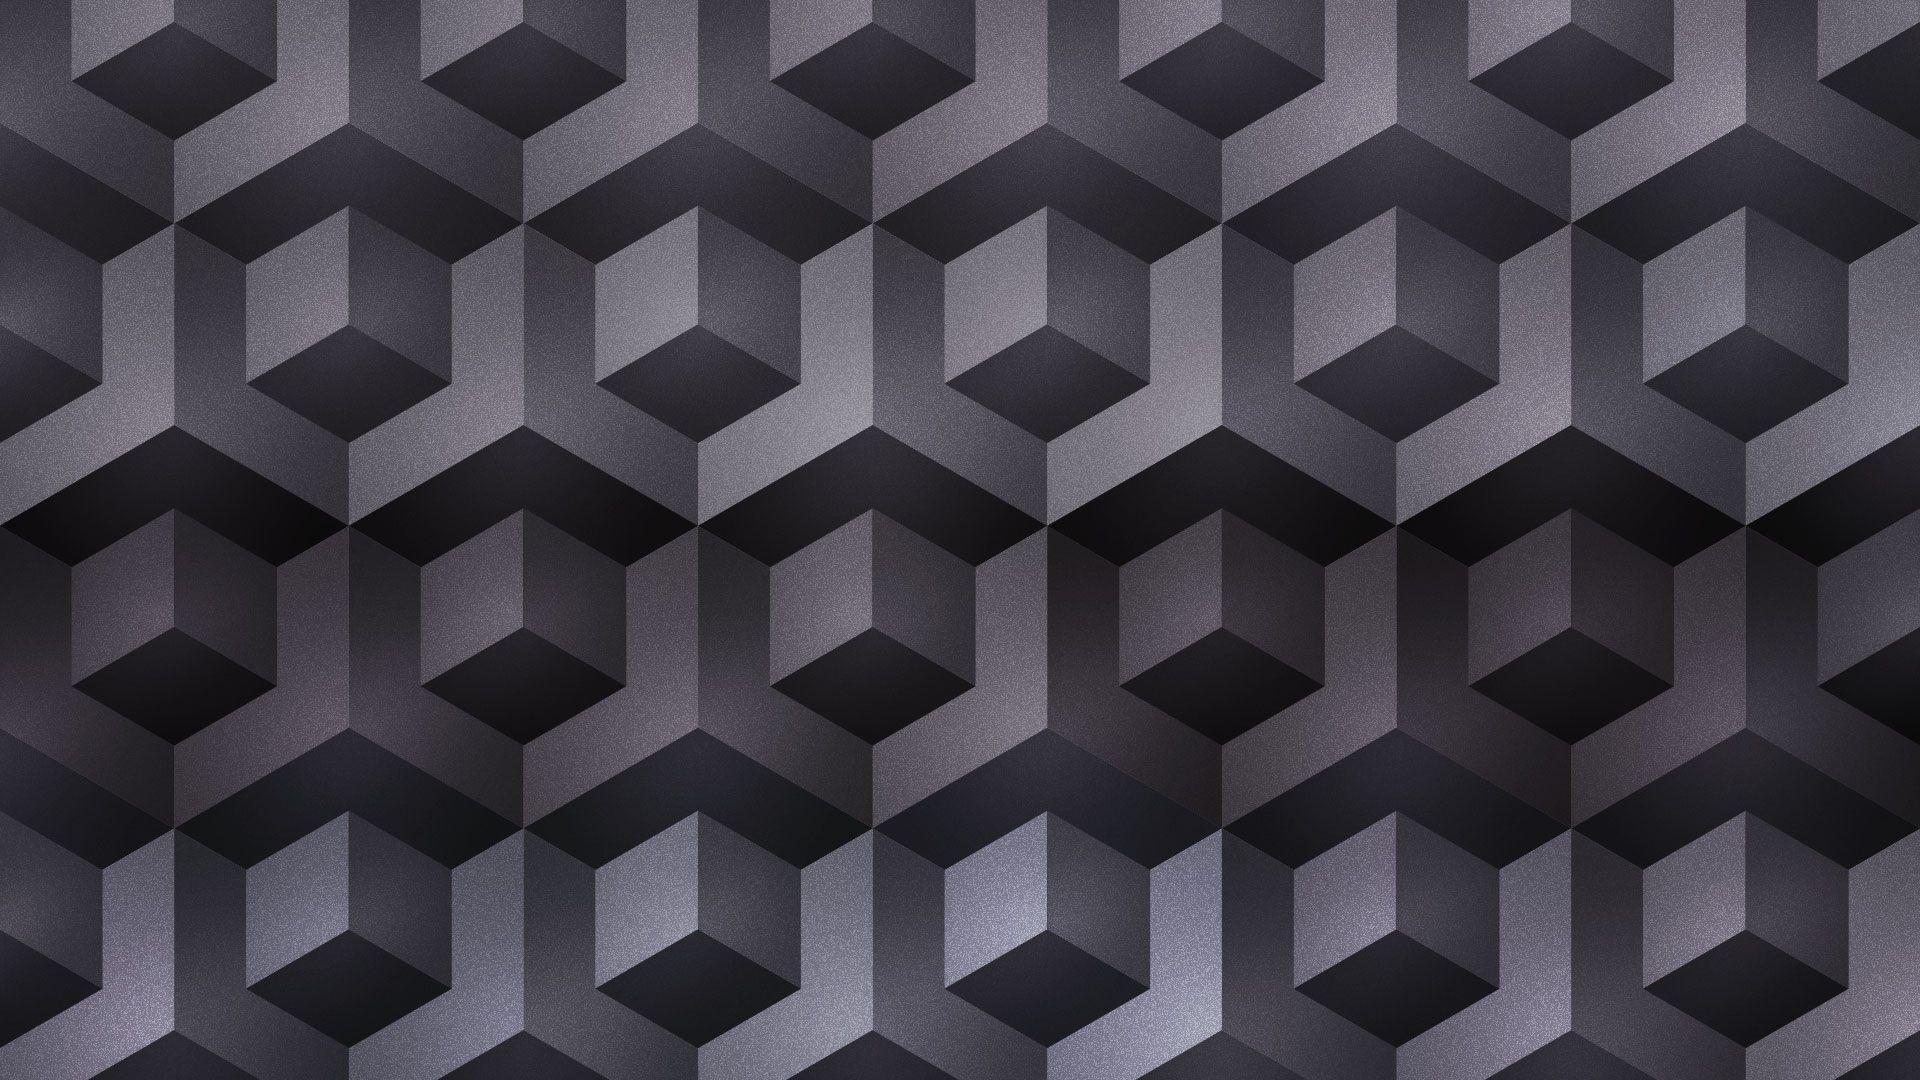 Tile Wallpapers Wallpaper Cave